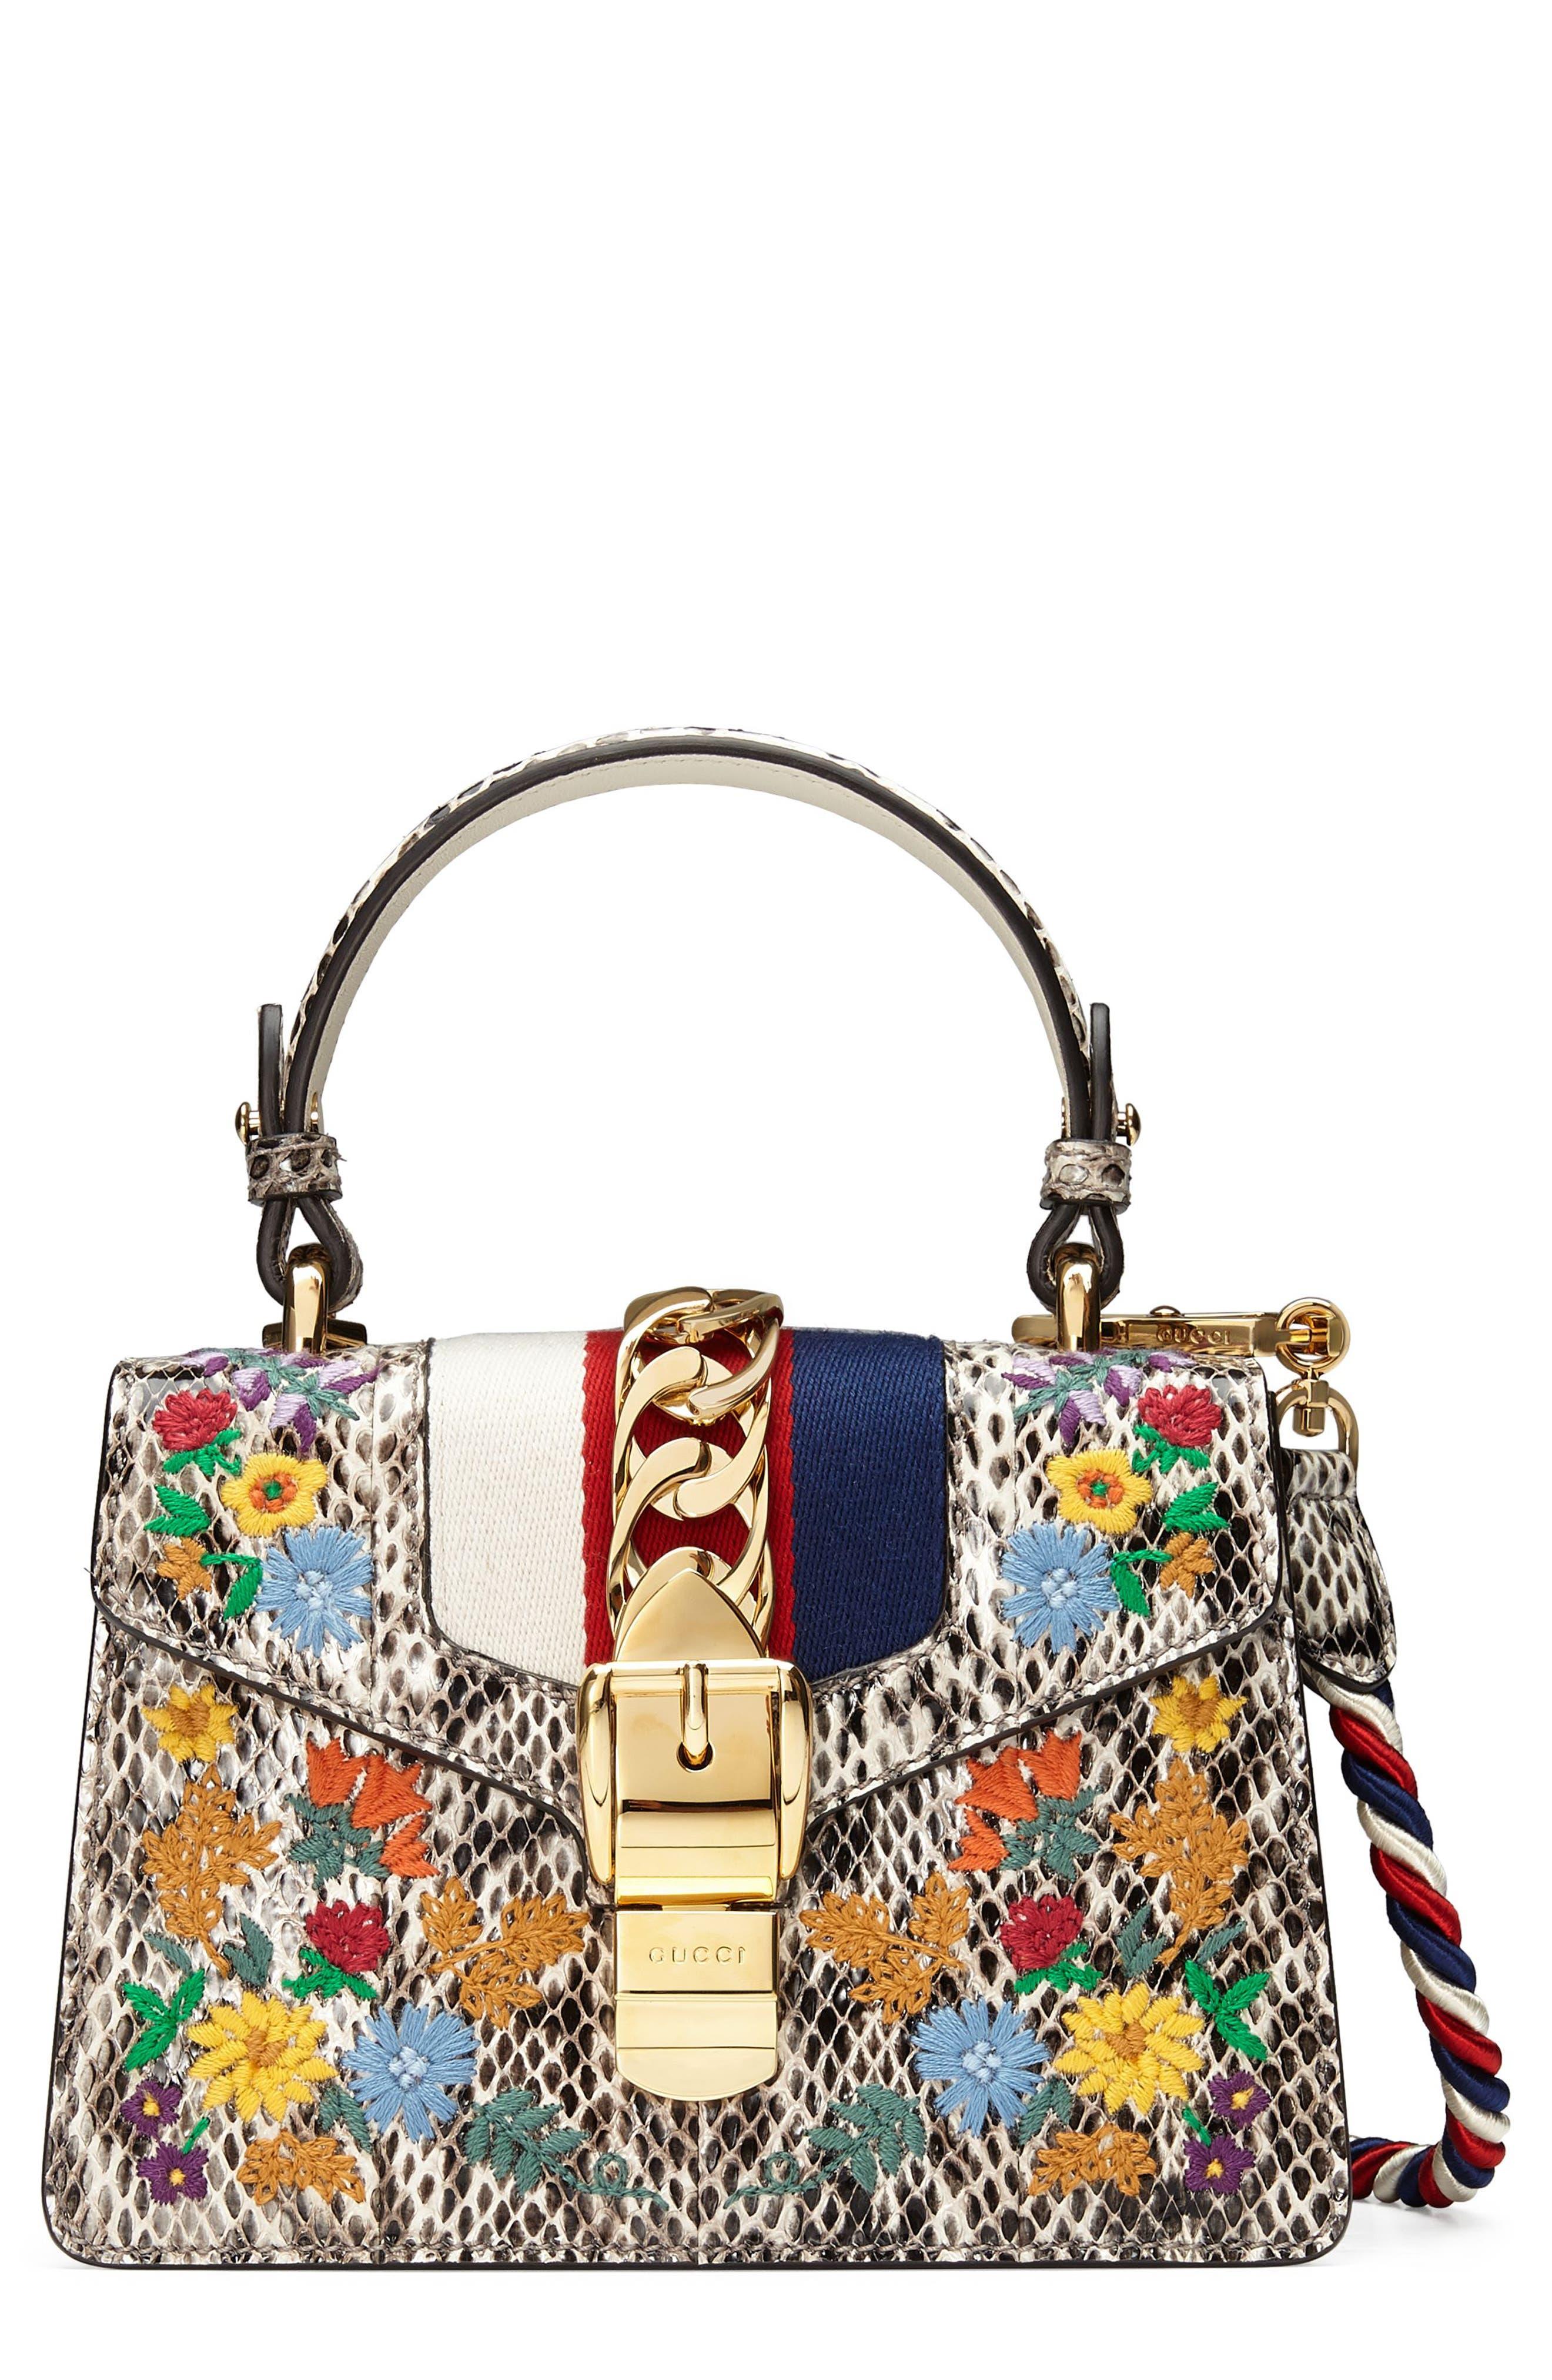 Gucci Mini Sylvie Genuine Snakeskin Top Handle Bag